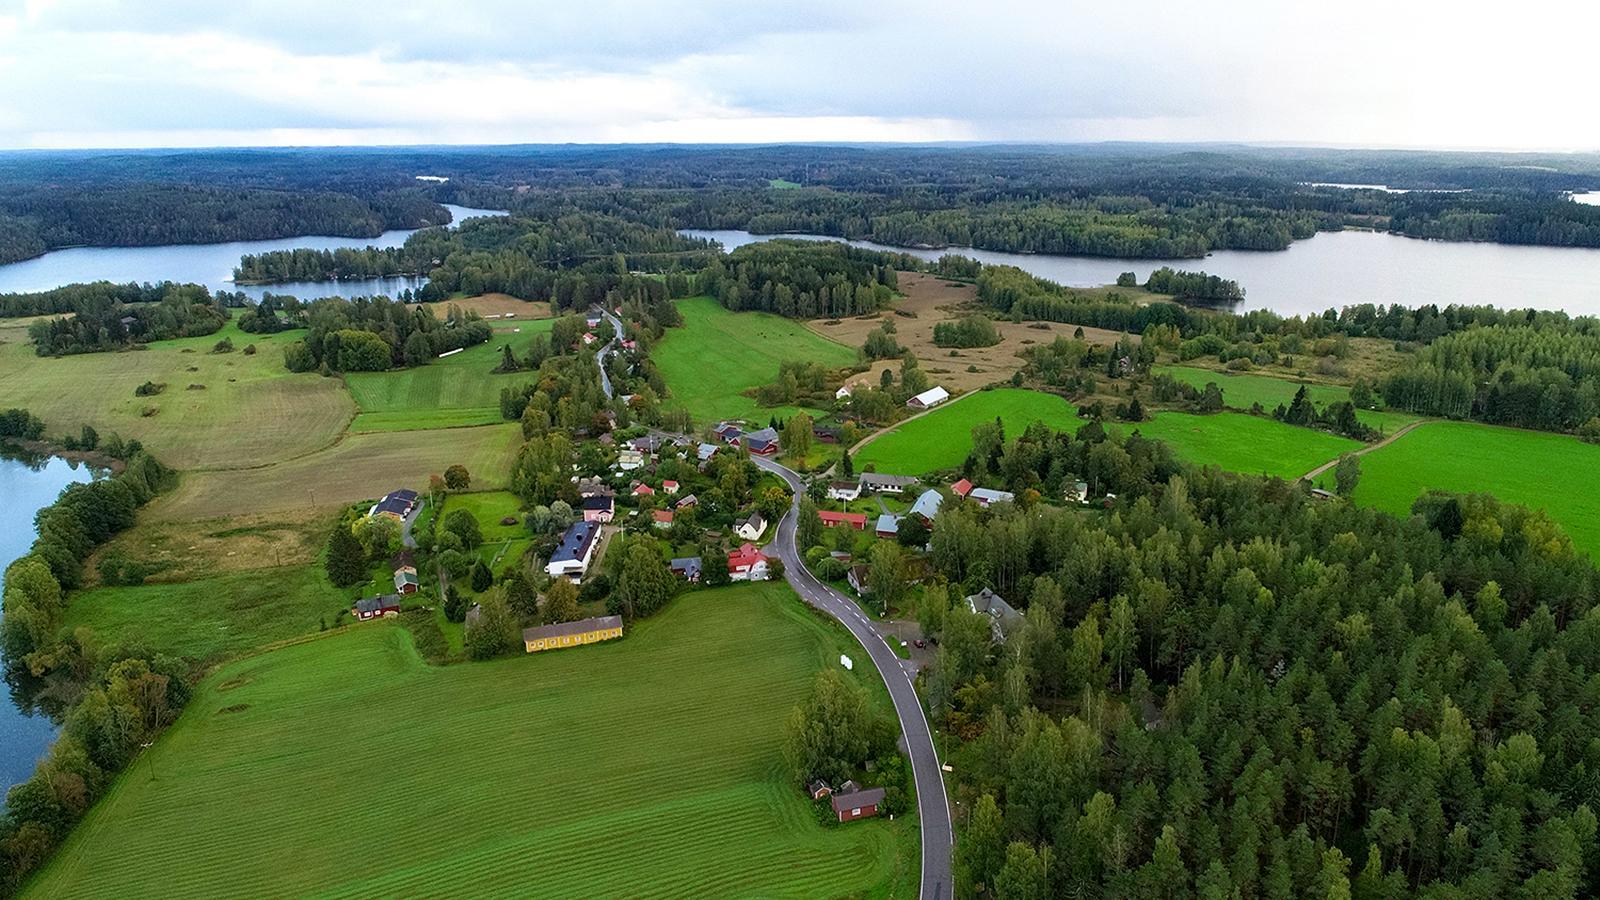 Valokuvaaja Timo Ahola - Drone-ilmakuvaus - Puutikkala (c) Valokuvaaja Timo Ahola